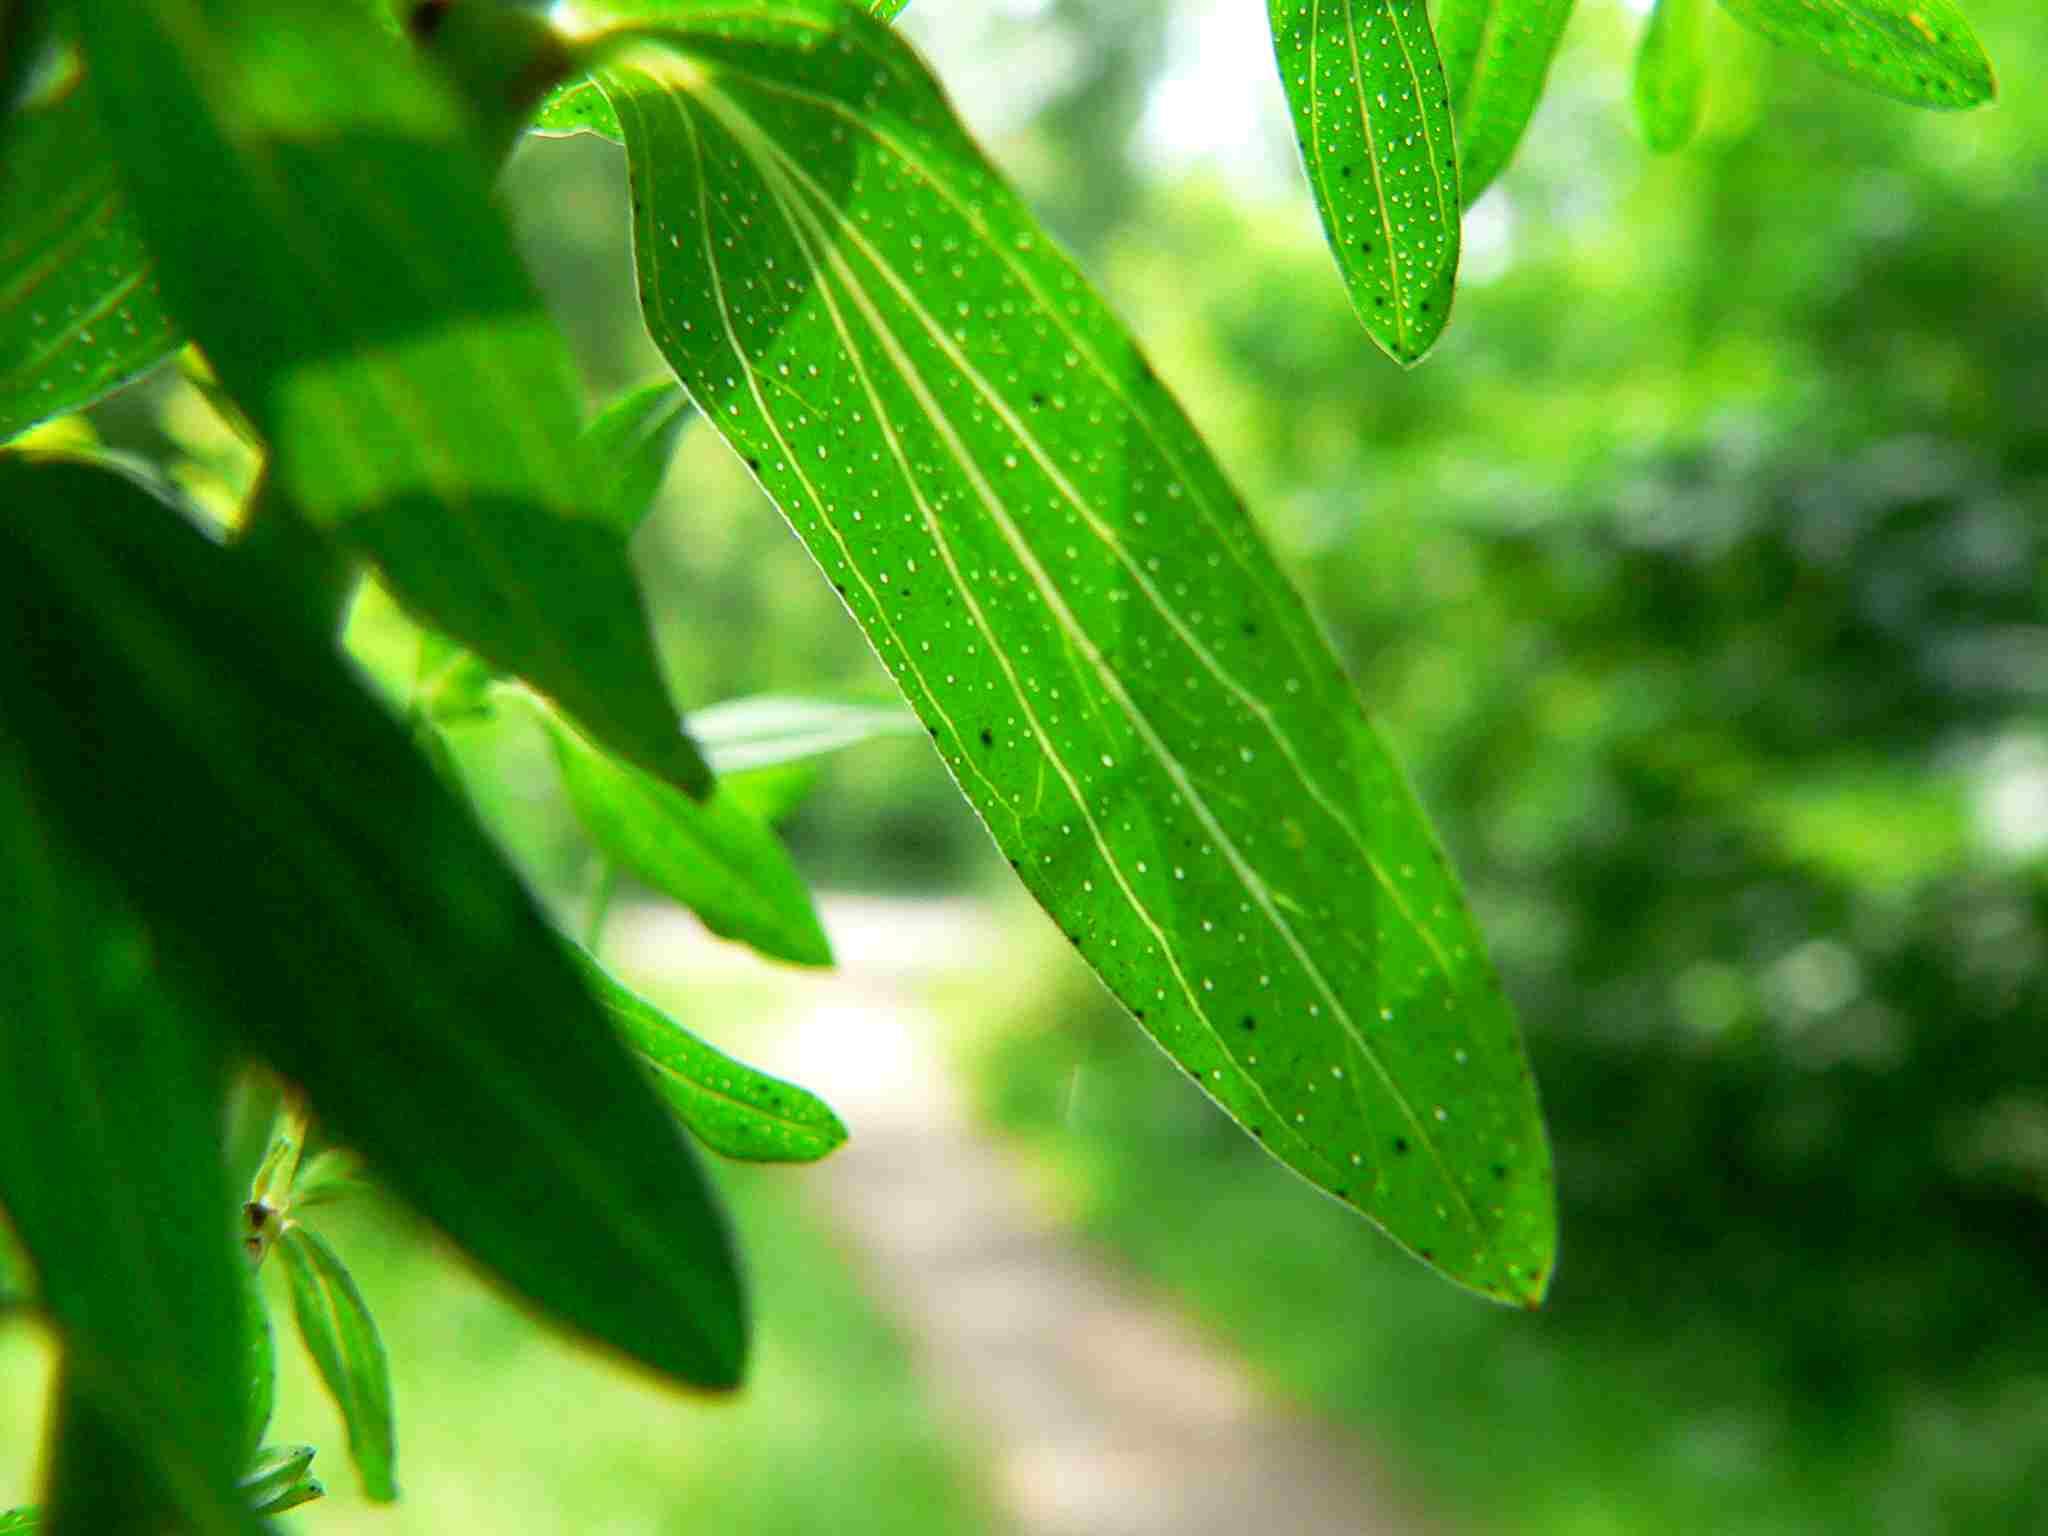 Johanniskraut, Blätter ganzrandig eiförmigmit Öldrüsen,  | copyright Britta Jessen